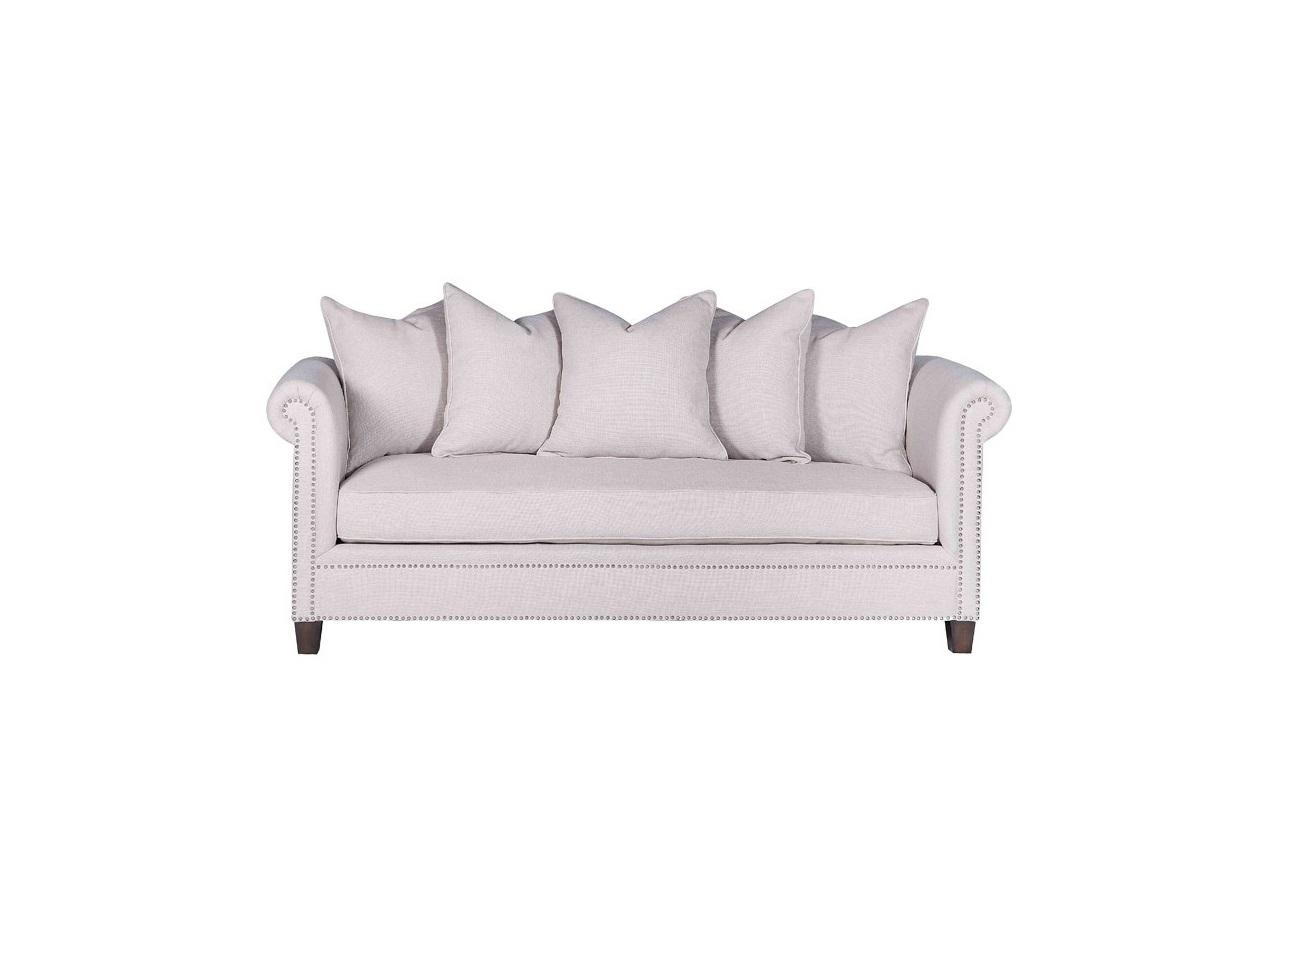 Gramercy диван audrey белый 85927/5